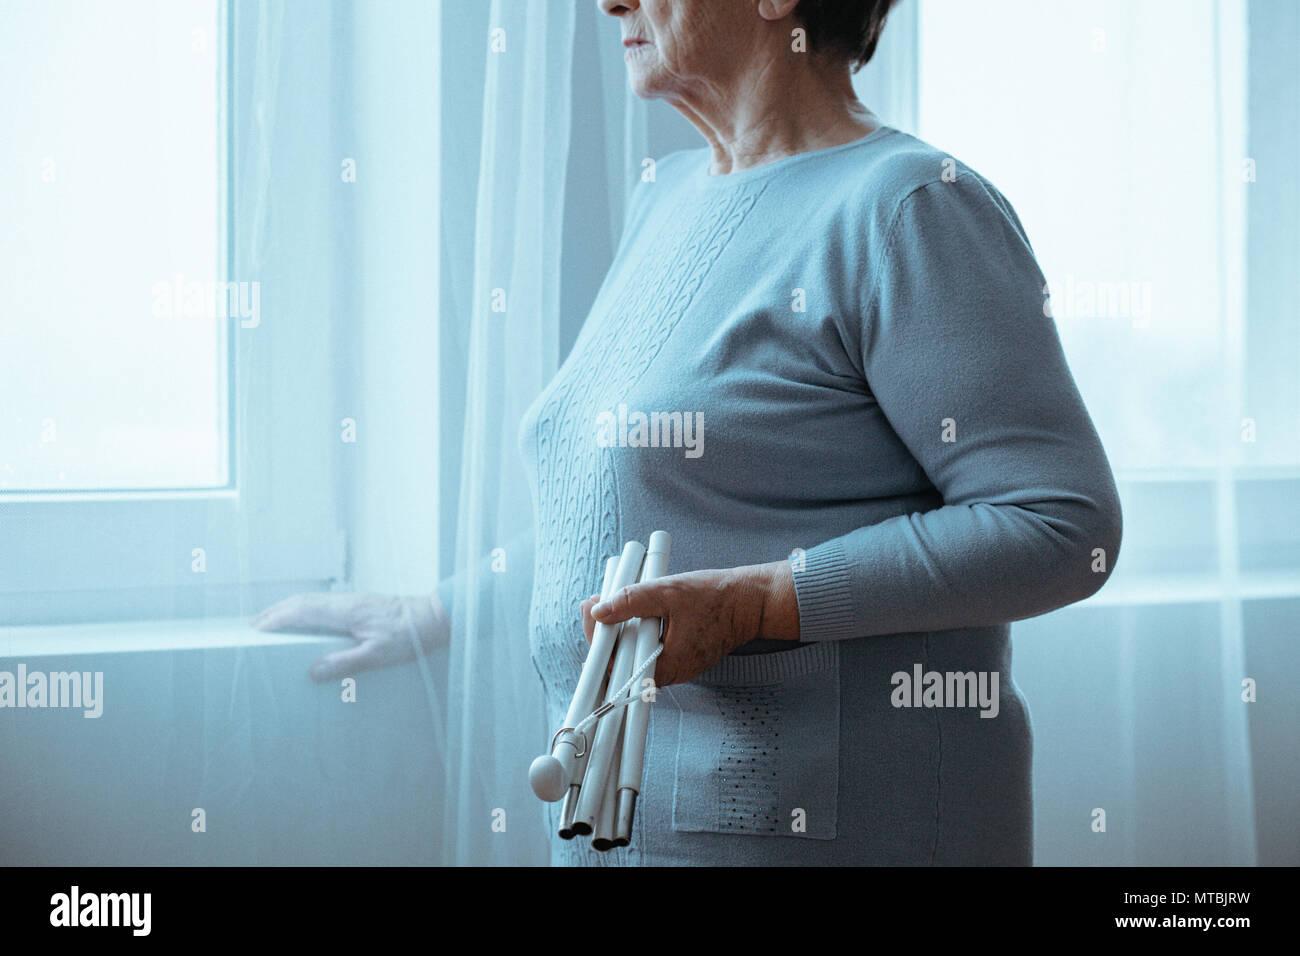 Senior, blind woman holding white cane, standing beside window - Stock Image